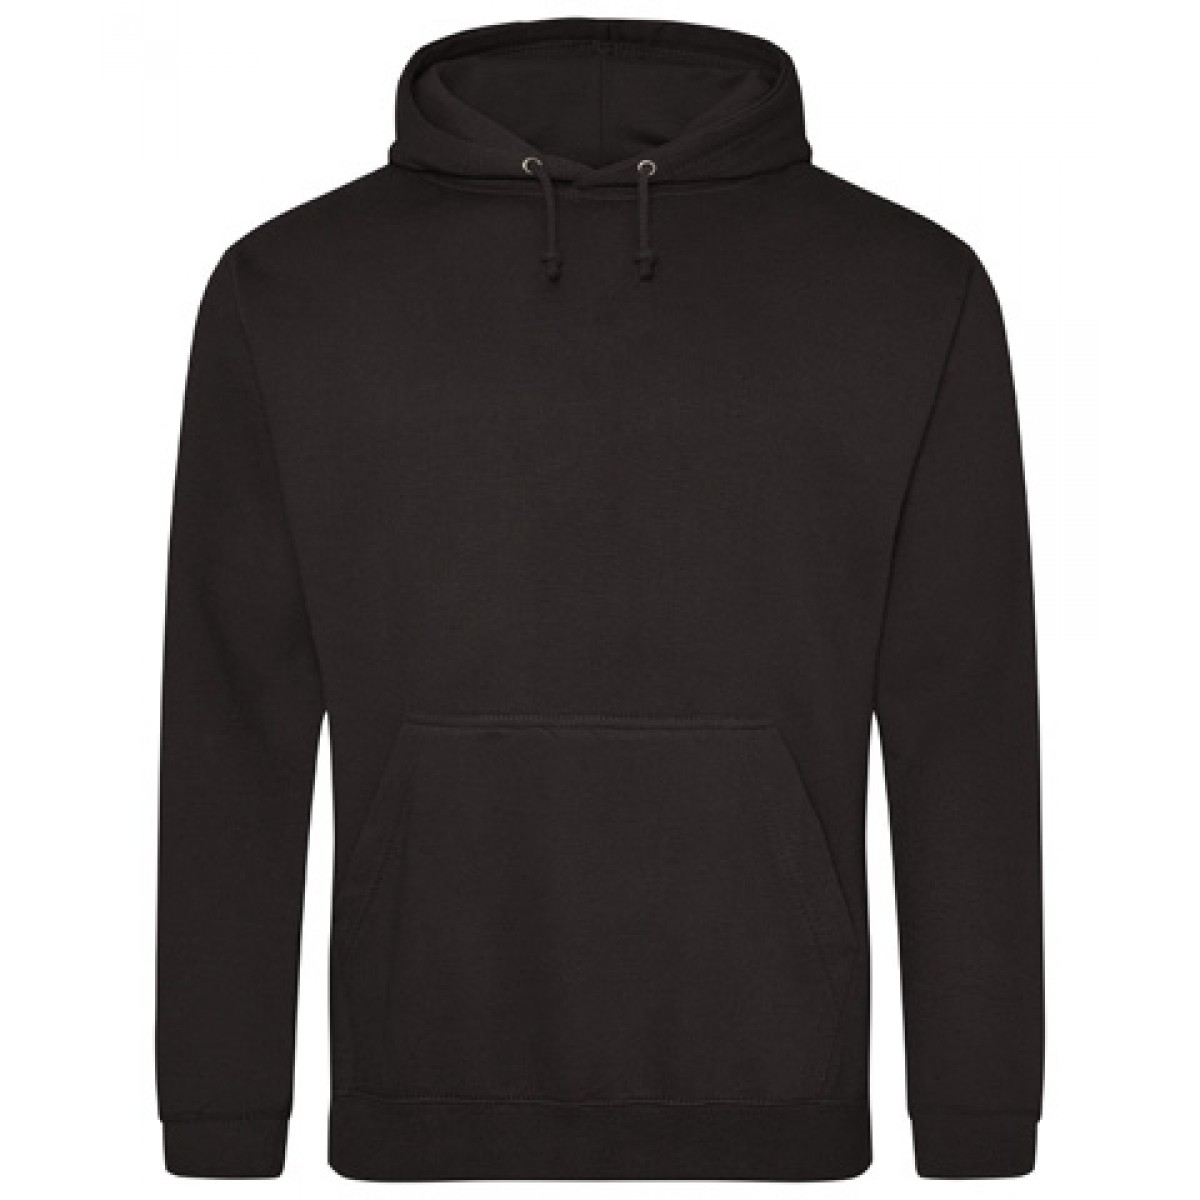 Hooded Sweatshirt 50/50 Heavy Blend-Black-XS